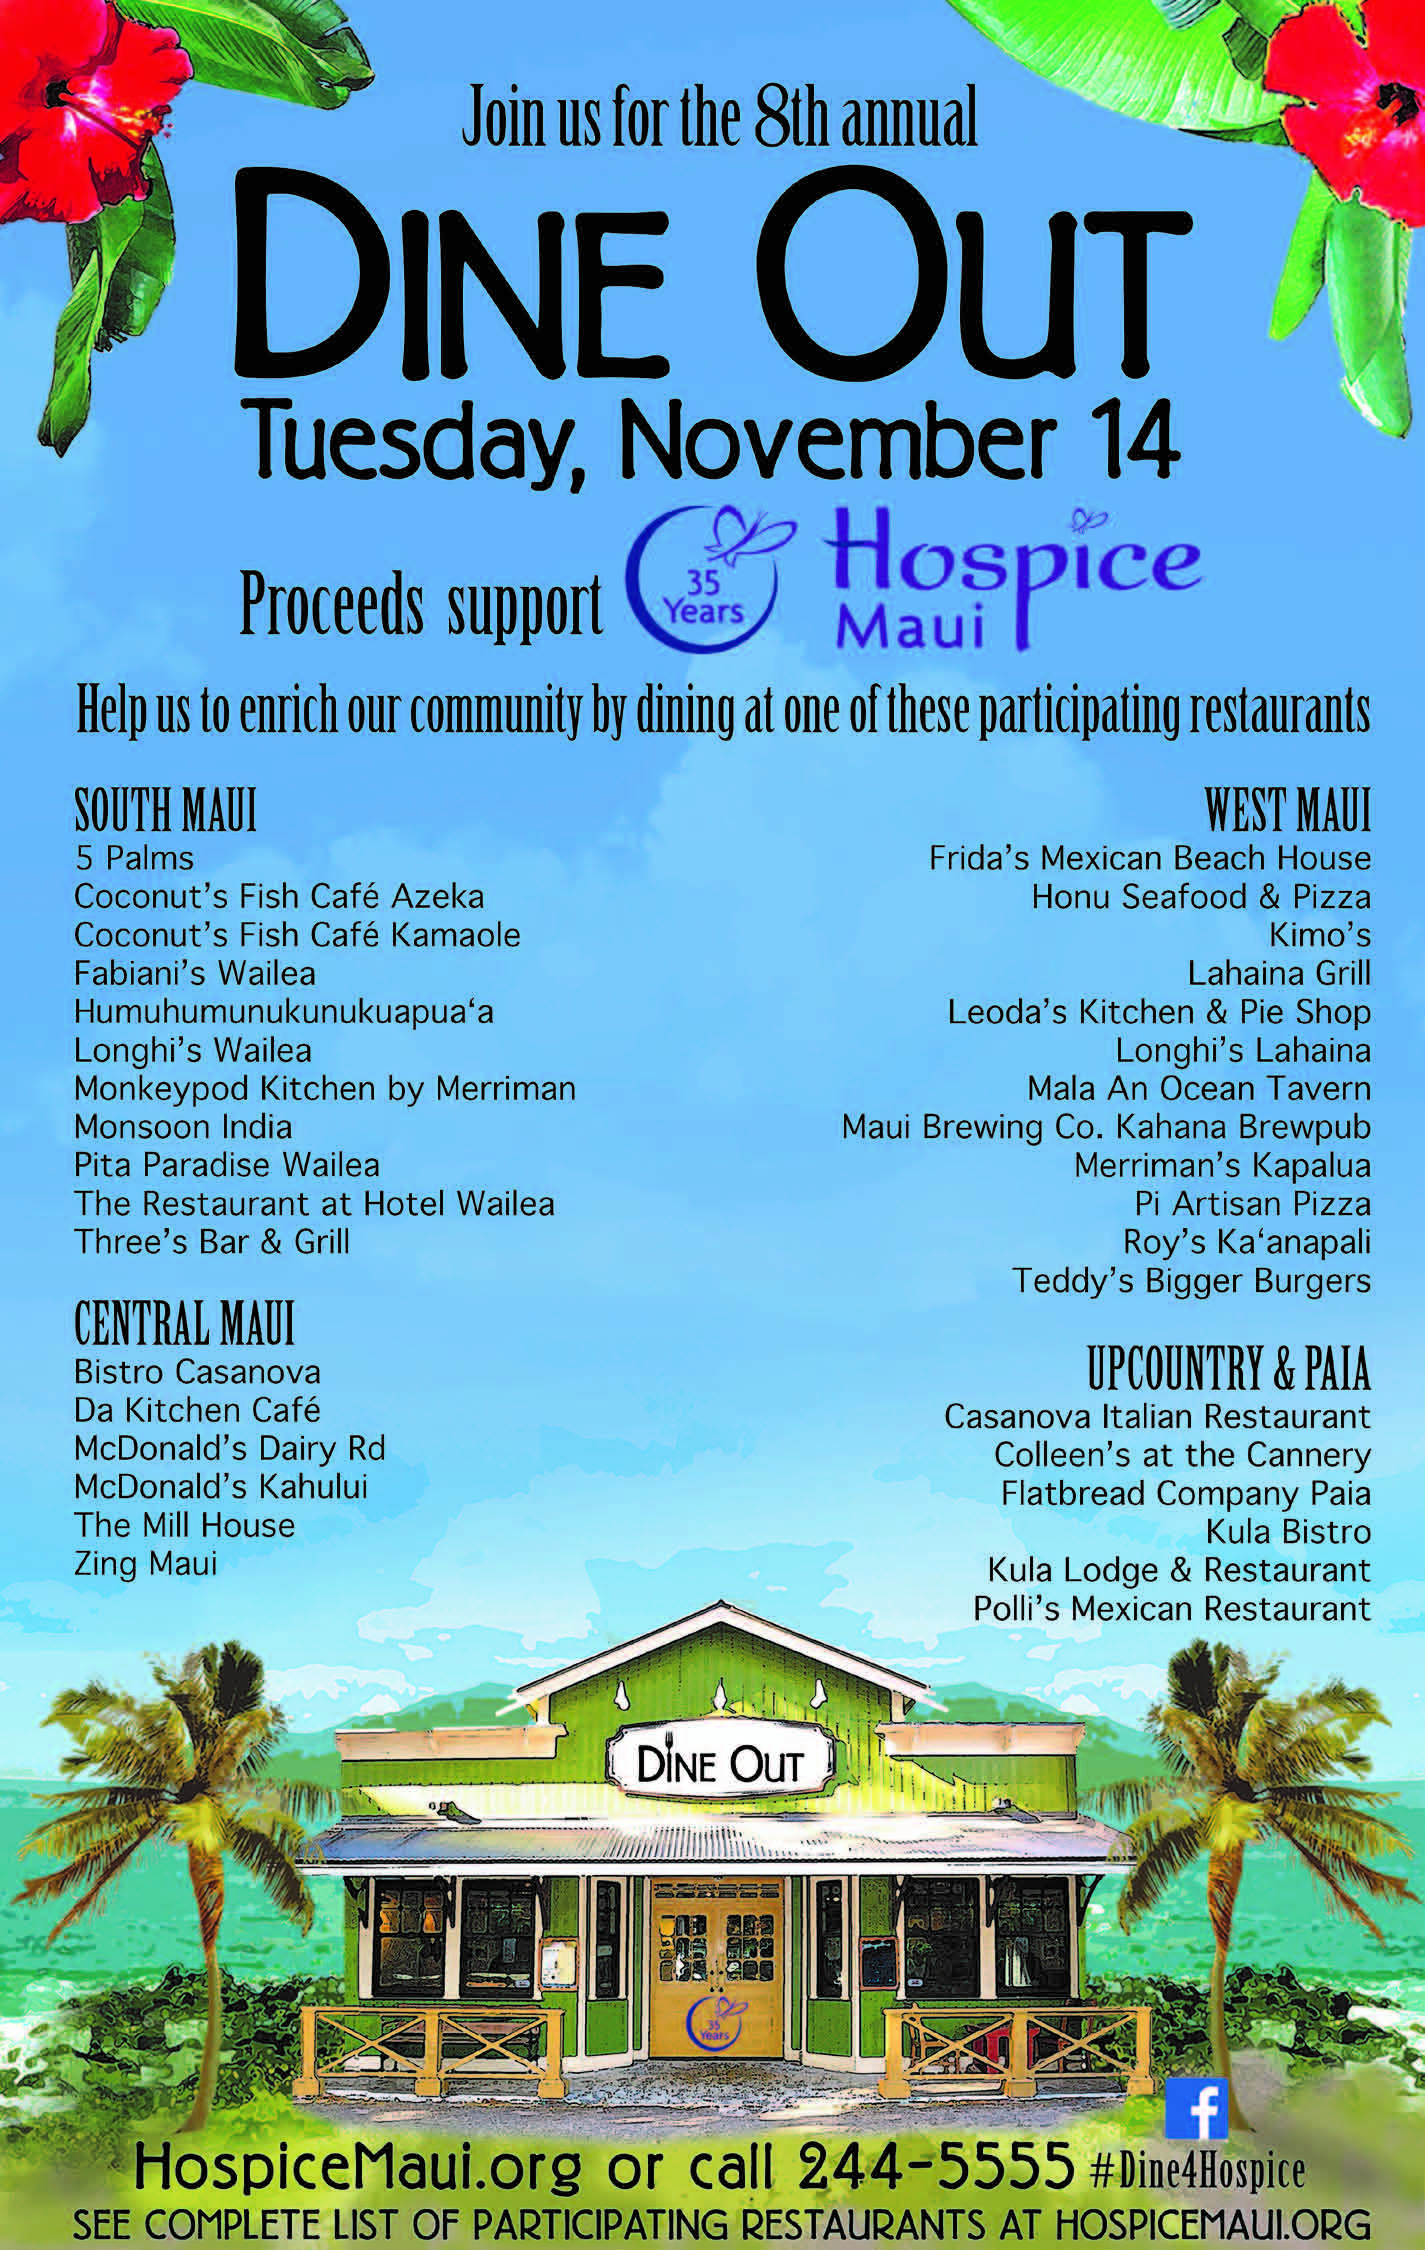 "Dine Out for Hospice Maui!"" Tuesday, November 14 - MAUI FAMILY"